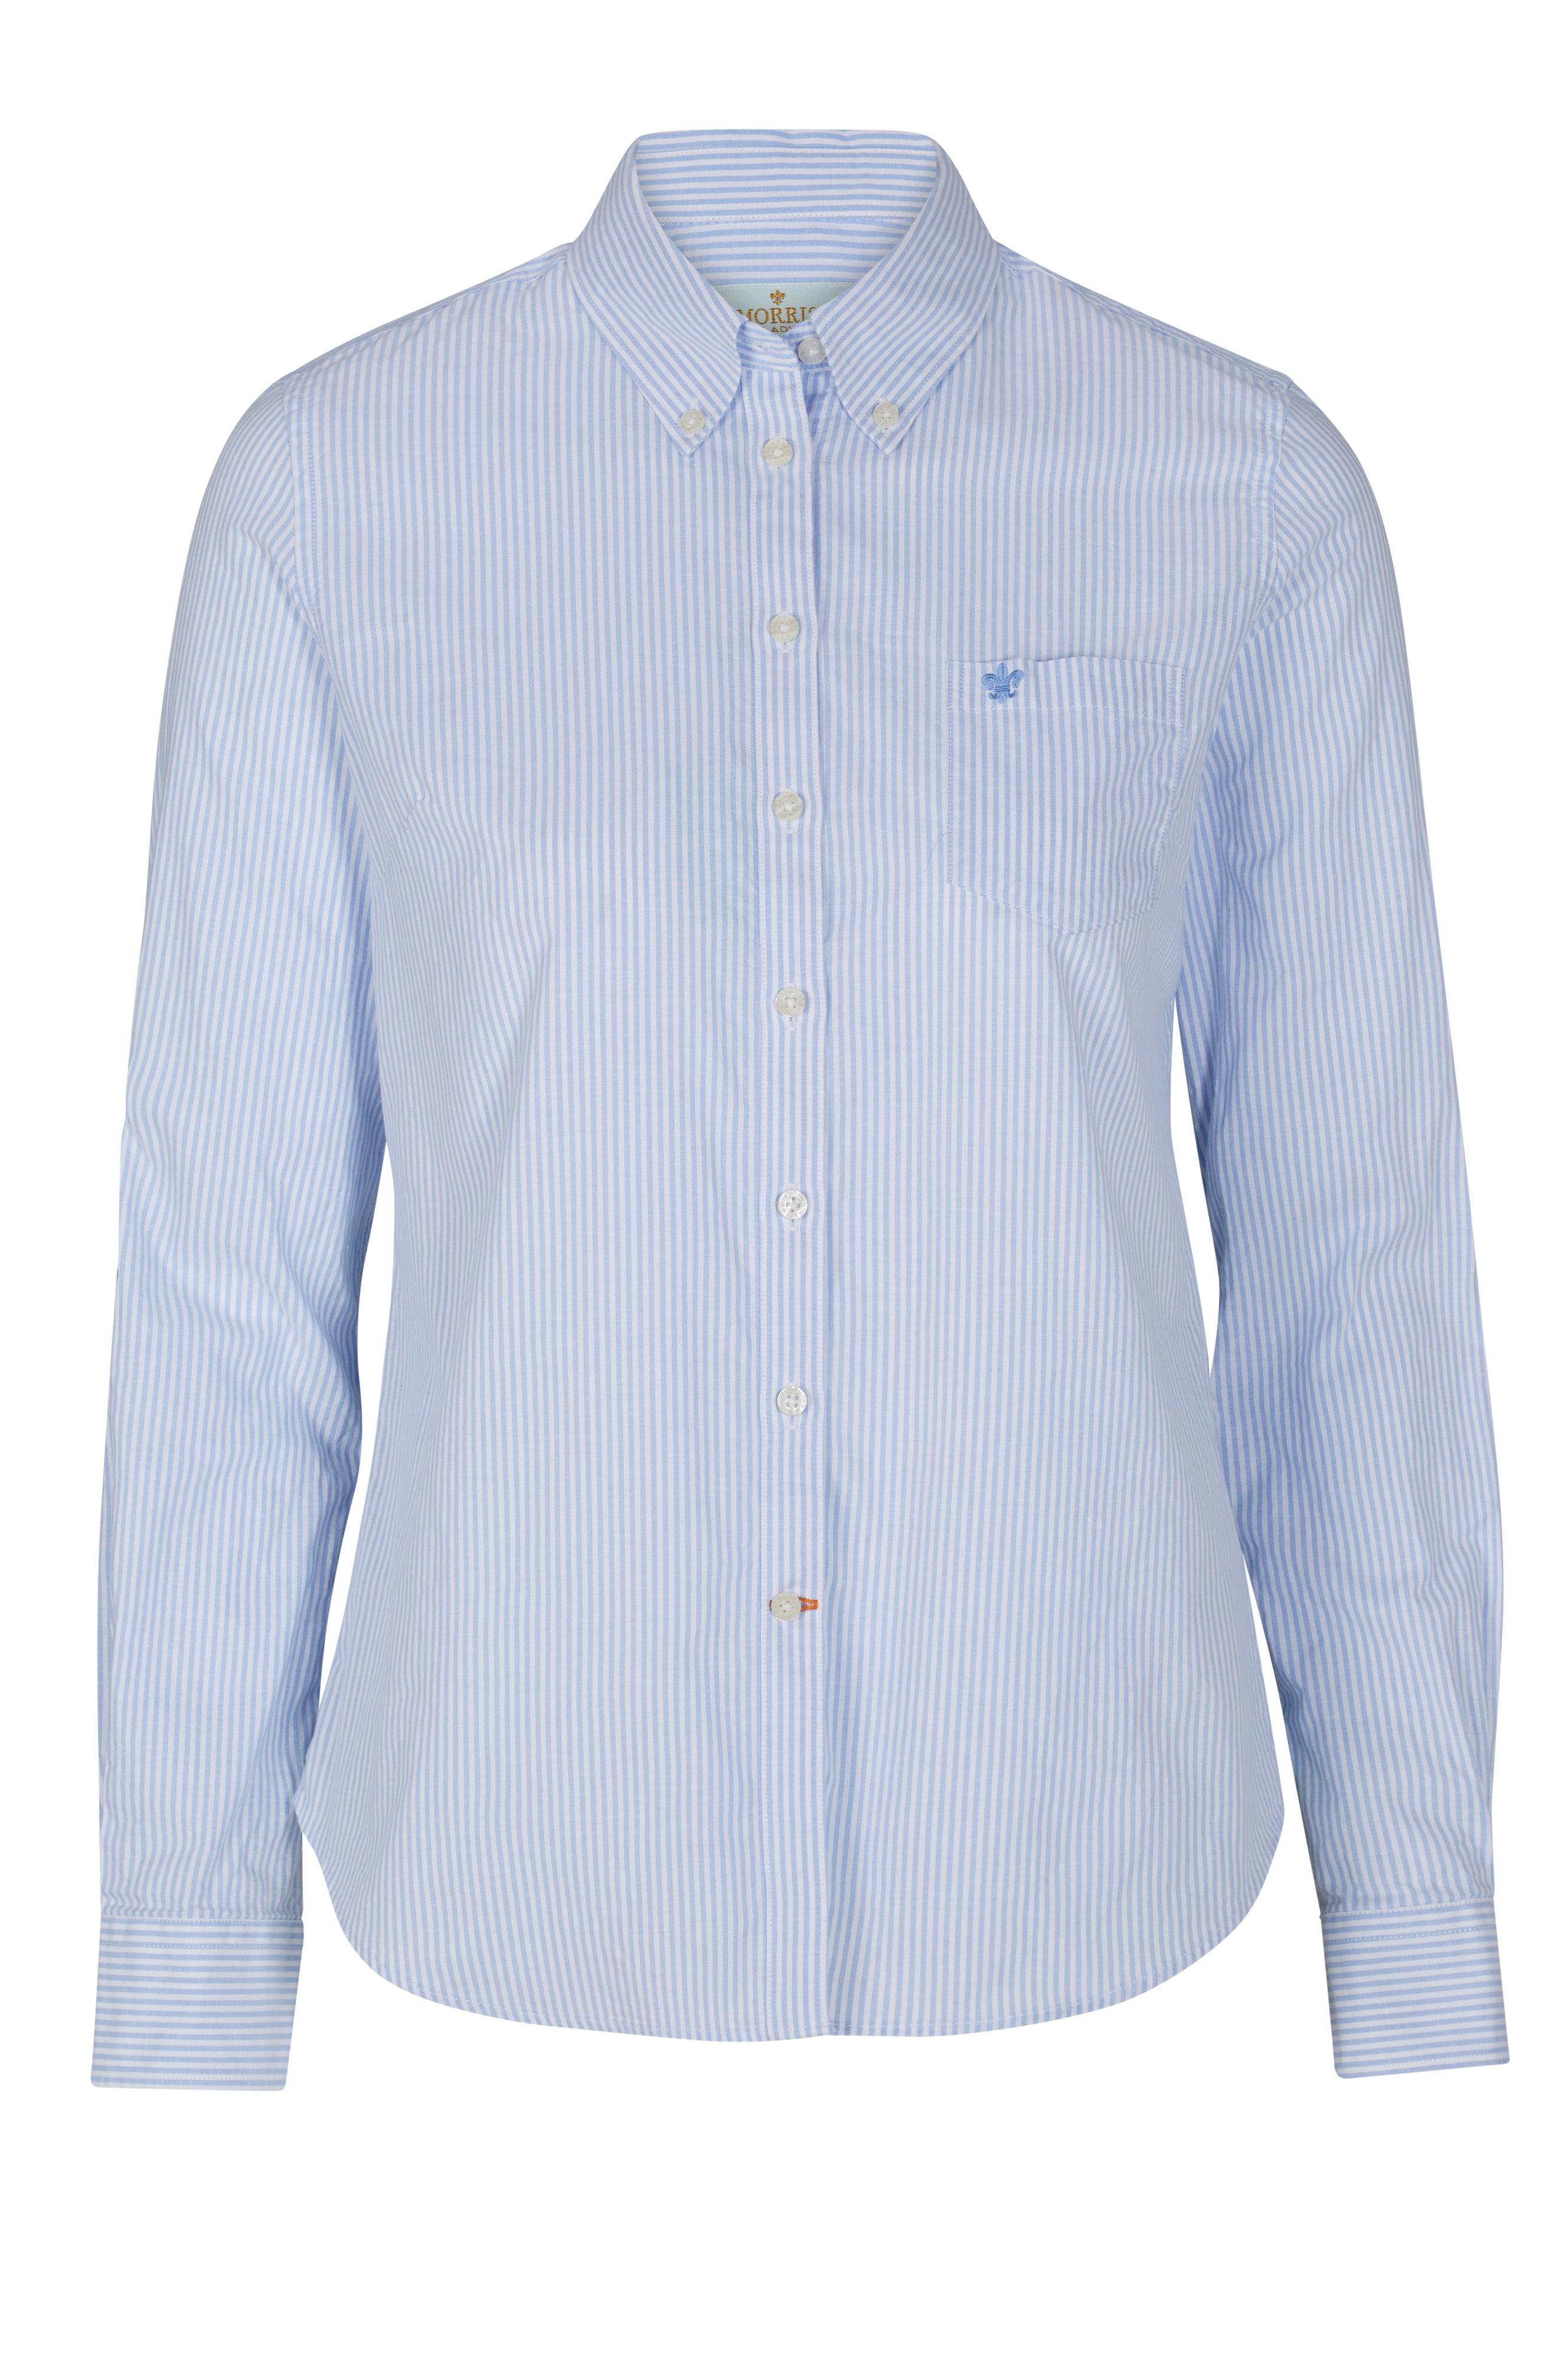 Morris Skjorta Classic Oxford Stripe - Blå - Dam - Ellos.se 06ba7f4cac444